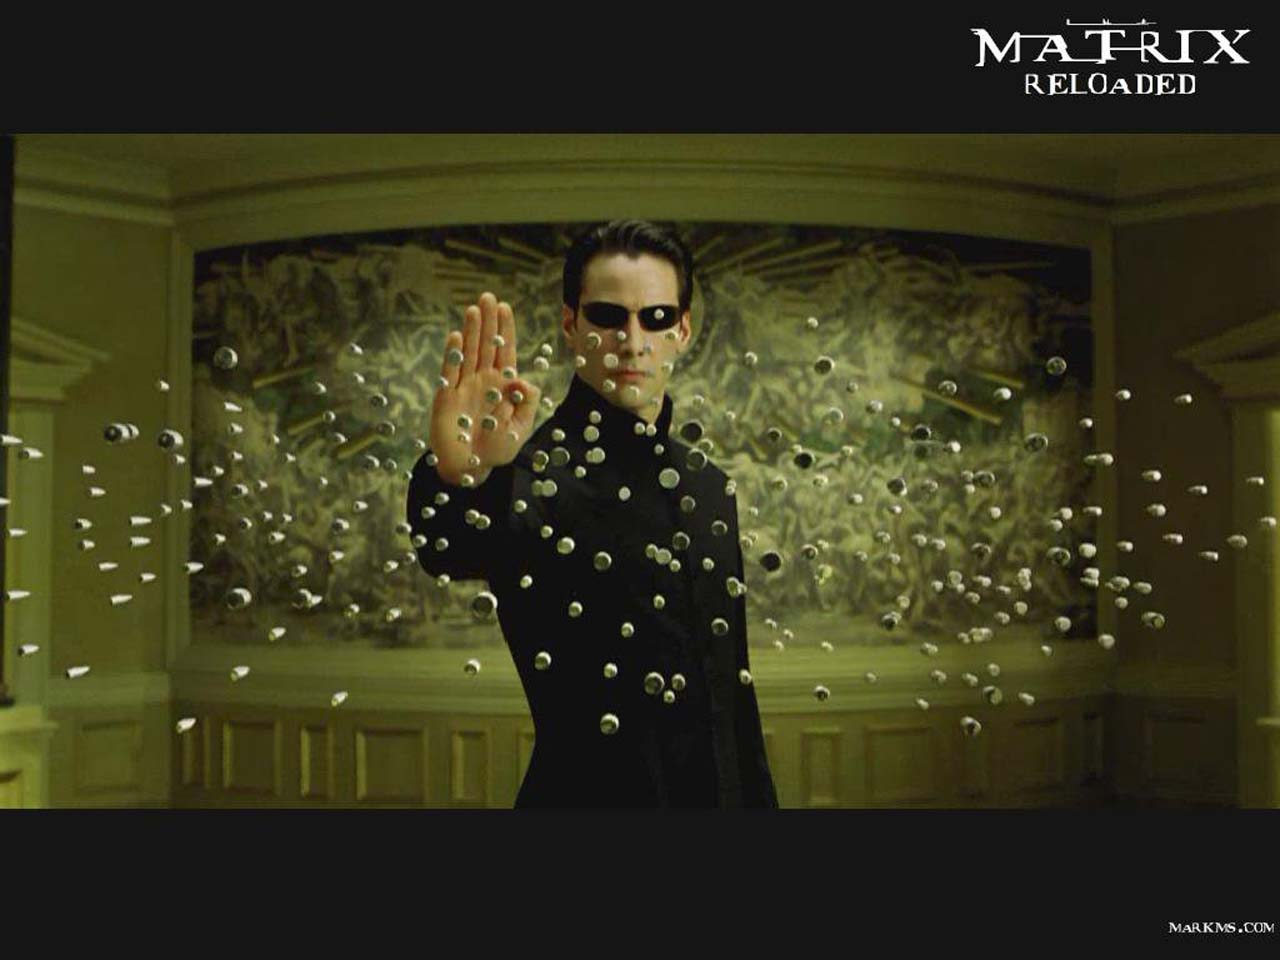 neo_matrix_keanu_reeves_ammunition_bullets_desktop_1024x768_hd-wallpaper-121926